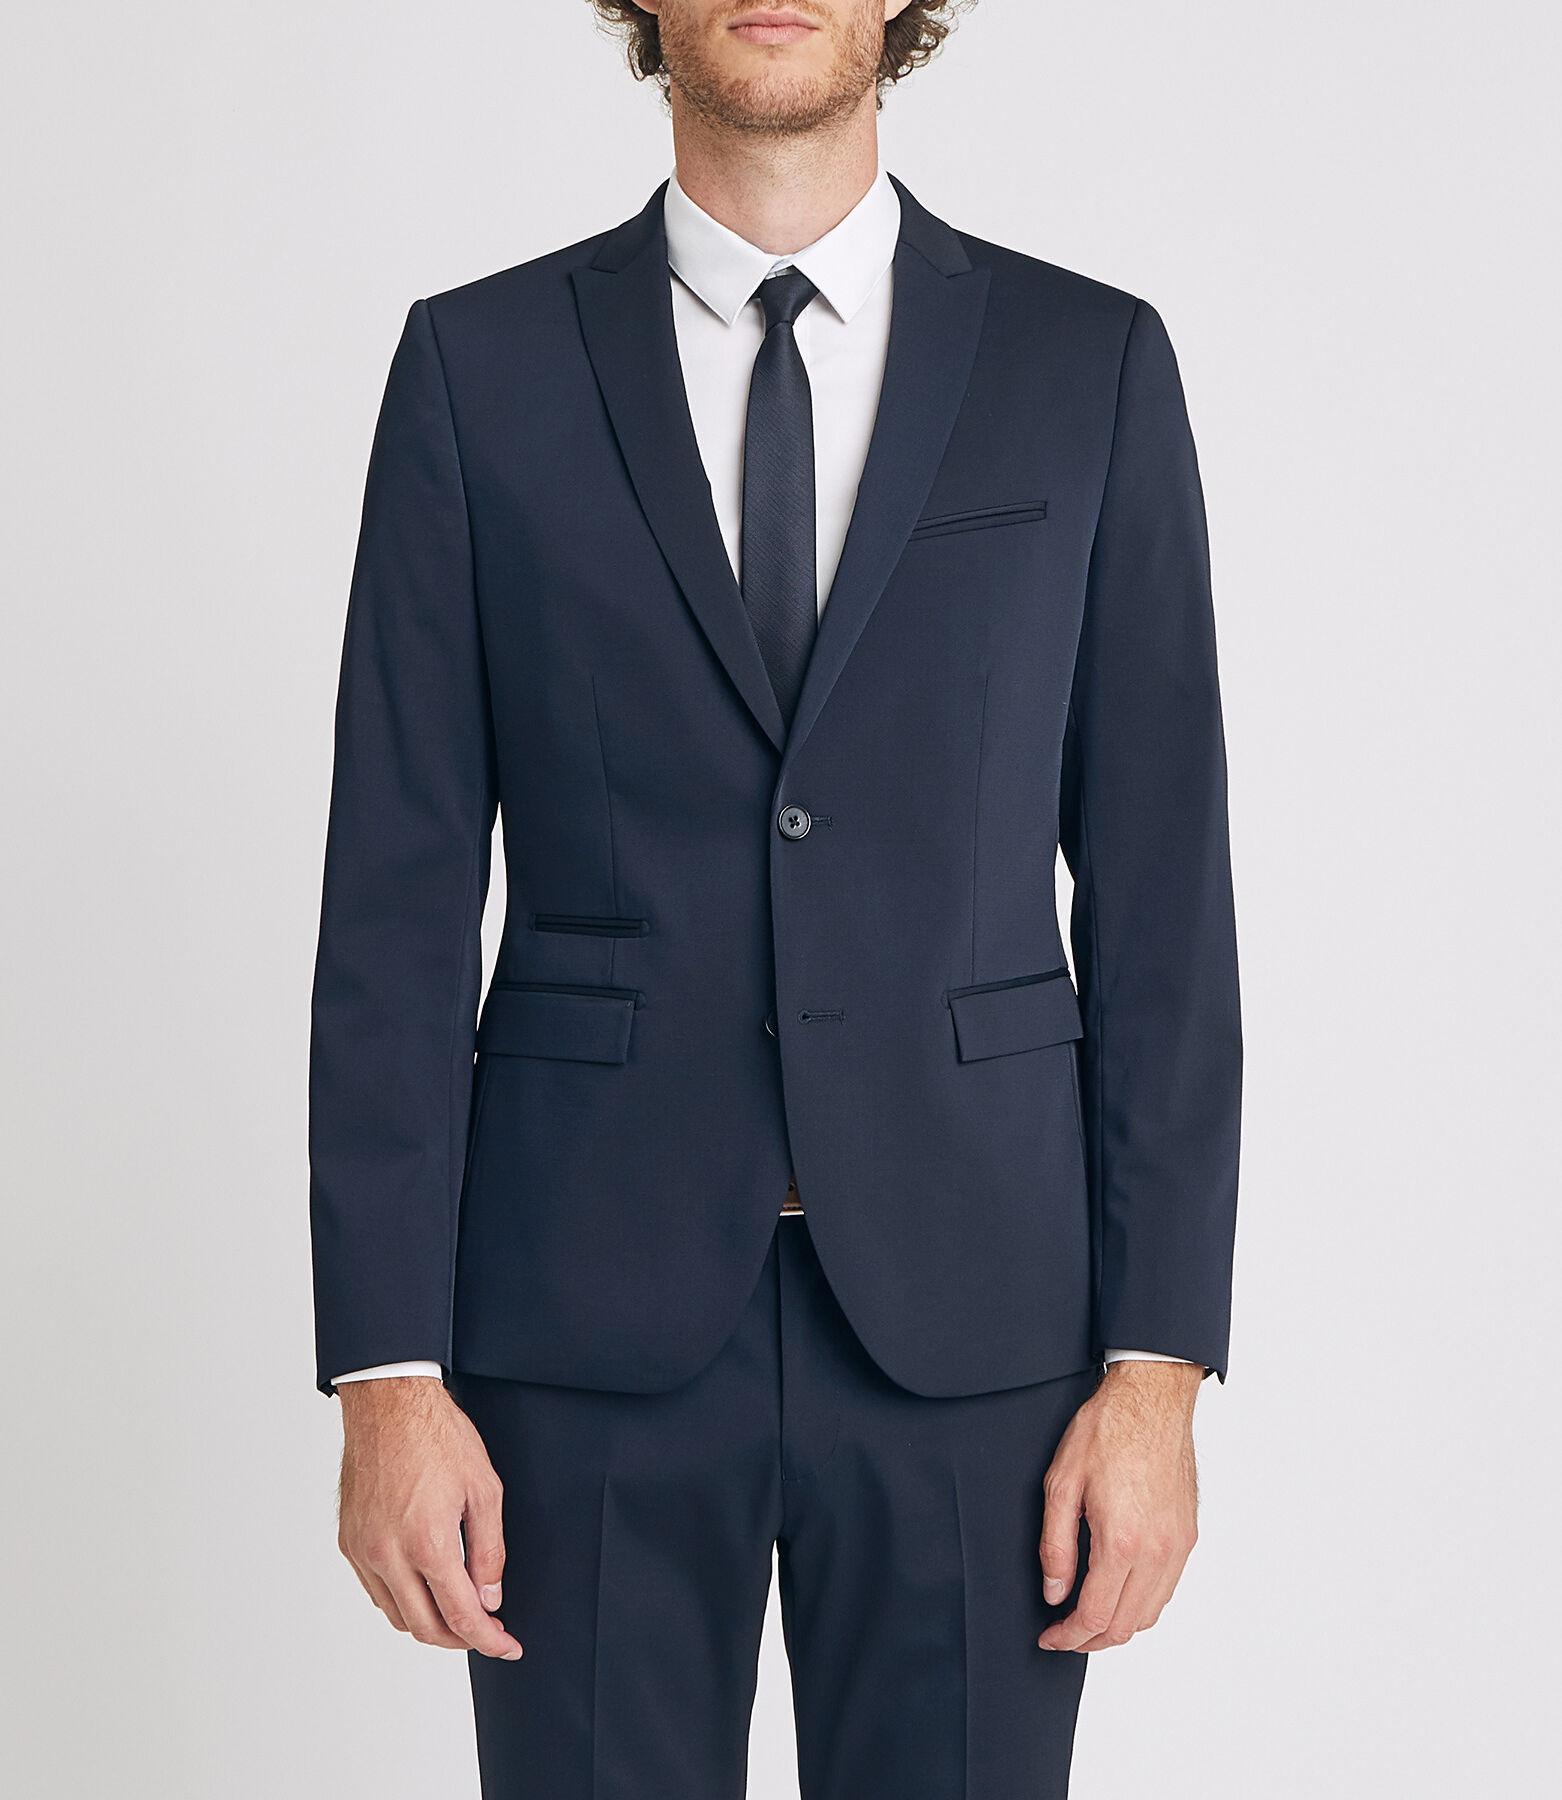 Veste de costume slim - Bleu Marine, Tailles 46 à 58